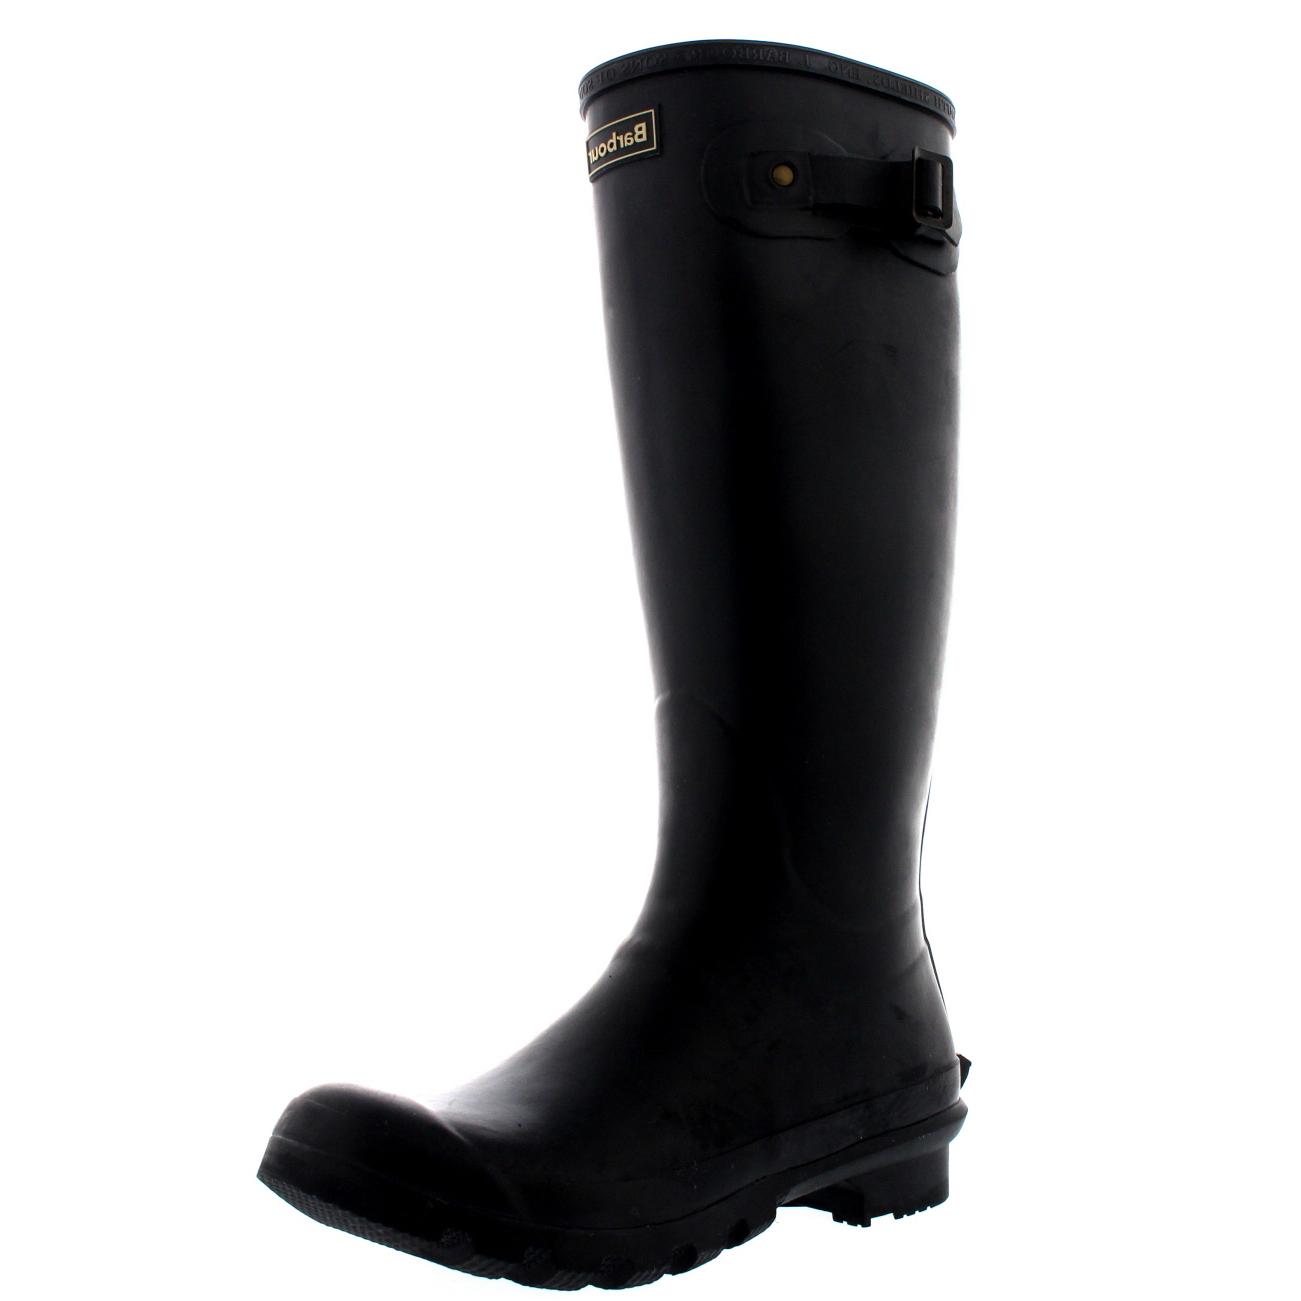 Womens-Barbour-Bede-Snow-Waterproof-Winter-Wellingtons-Mid-Calf-Boots-US-5-11 thumbnail 12